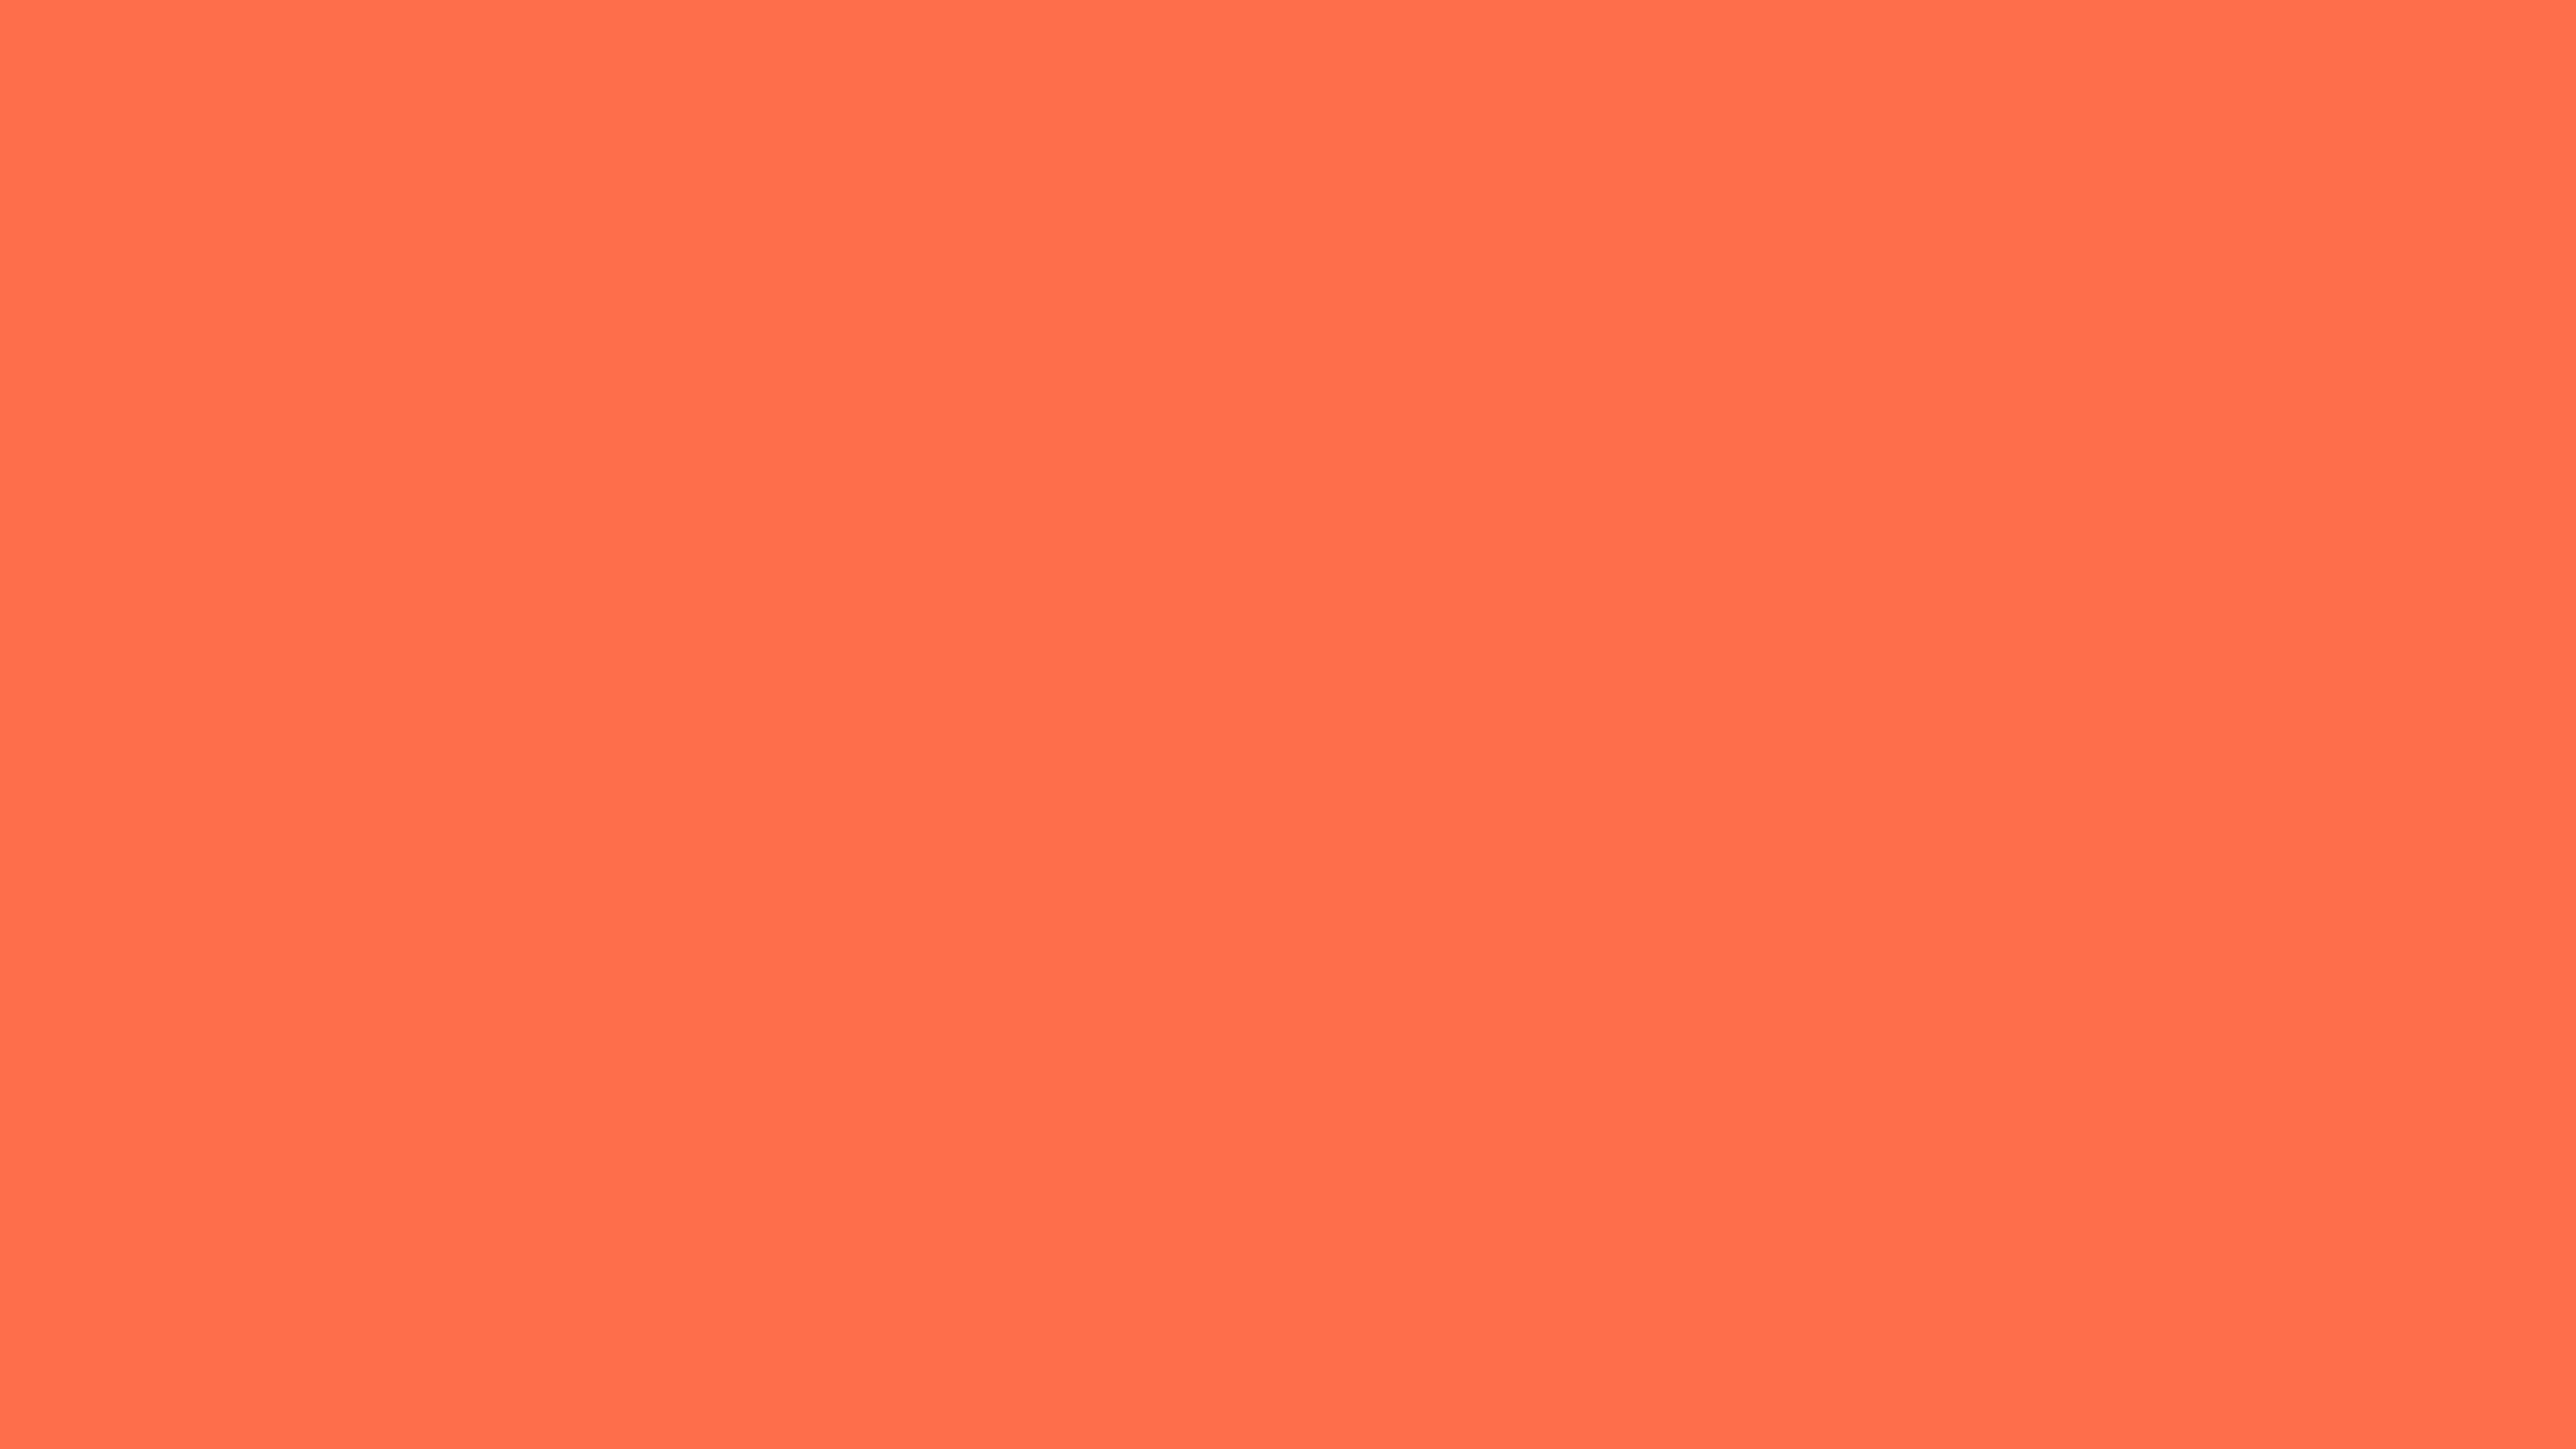 4096x2304 Outrageous Orange Solid Color Background